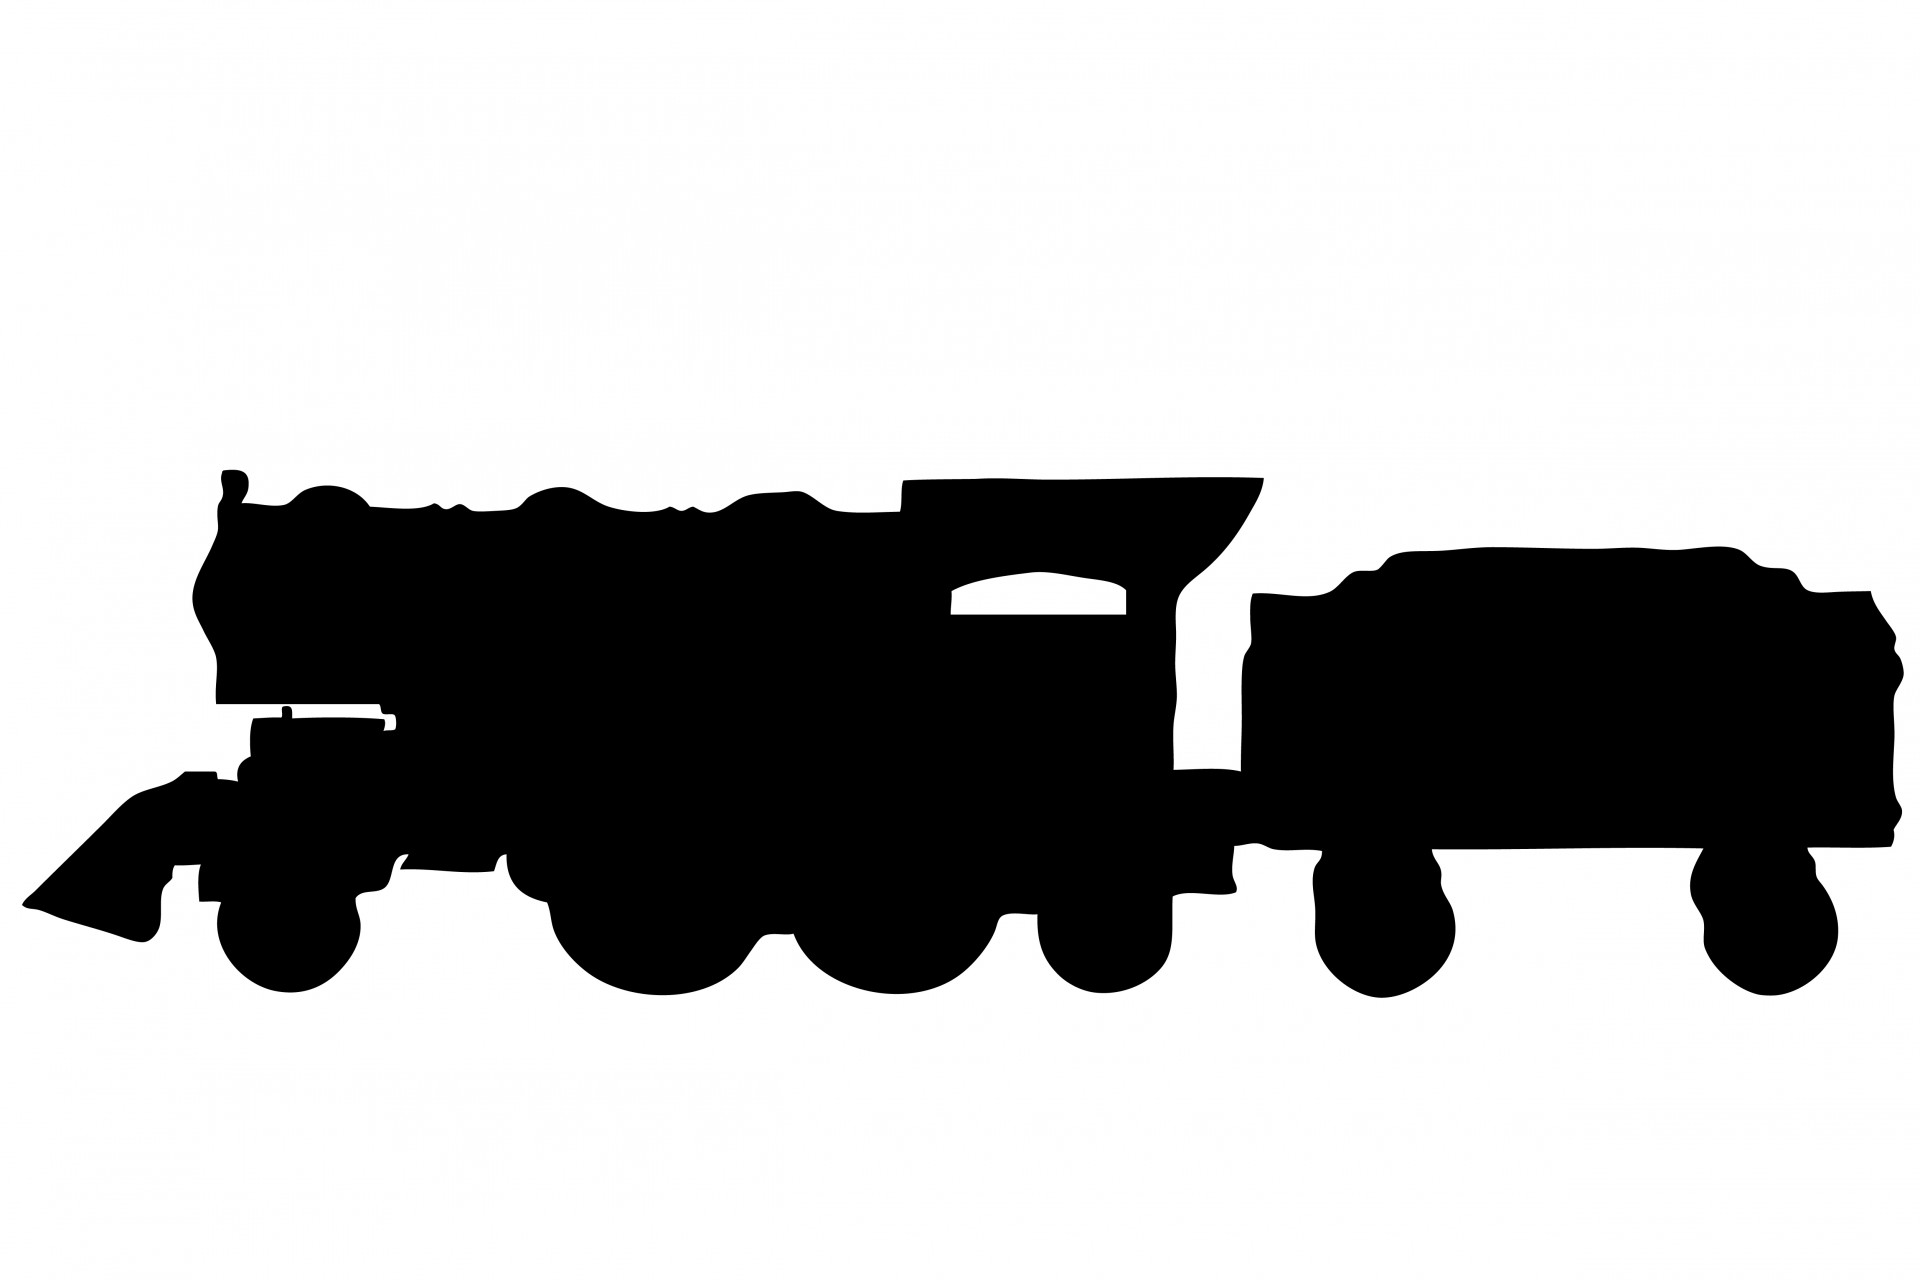 1920x1280 Vintage Steam Train Clipart Free Stock Photo